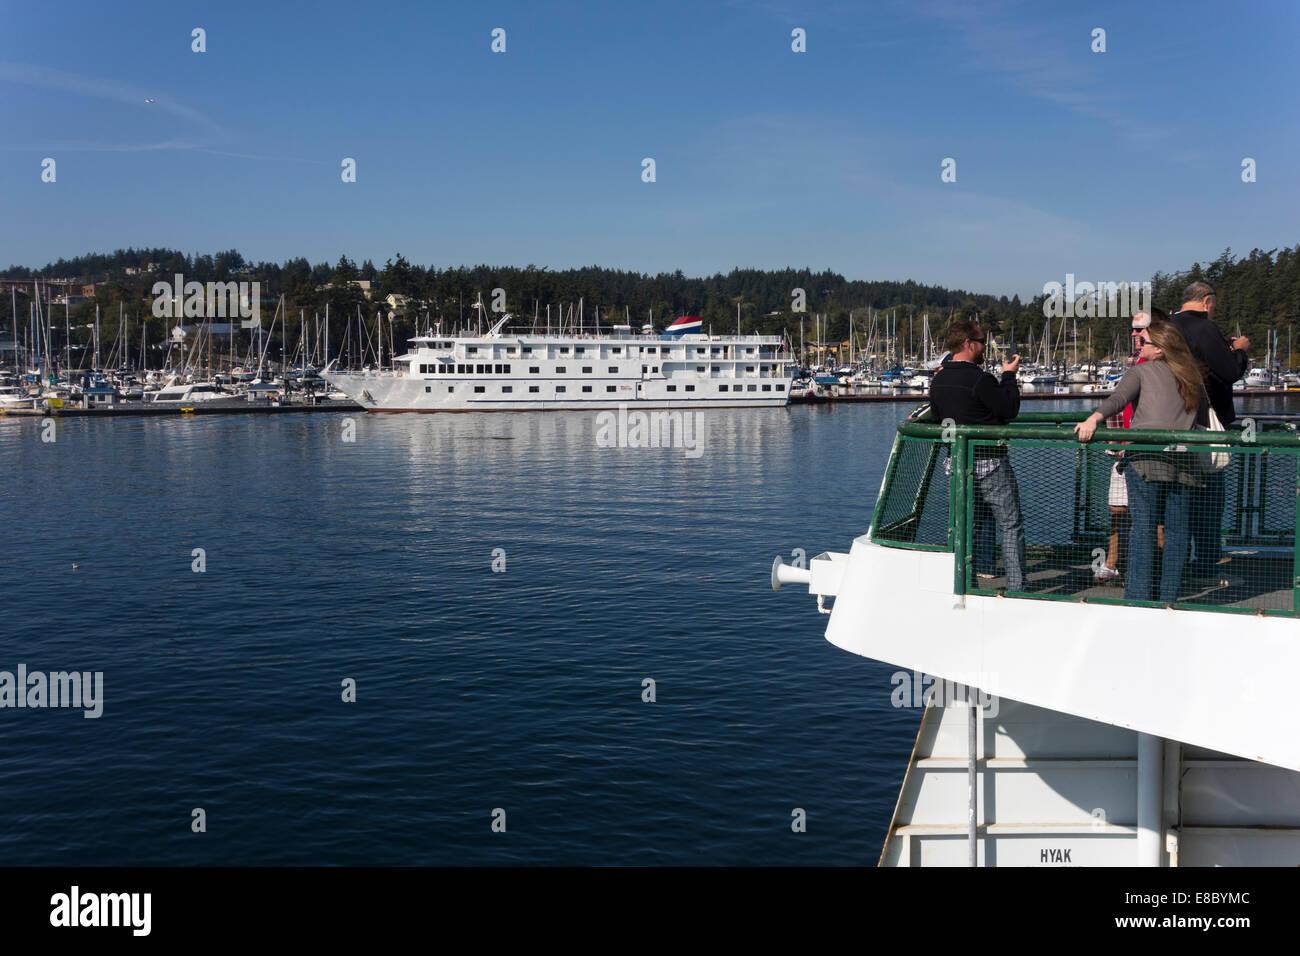 Washington State ferry approaching Roche Harbor, San Juan Islands, USA, with American Spirit cruise ship docked, - Stock Image